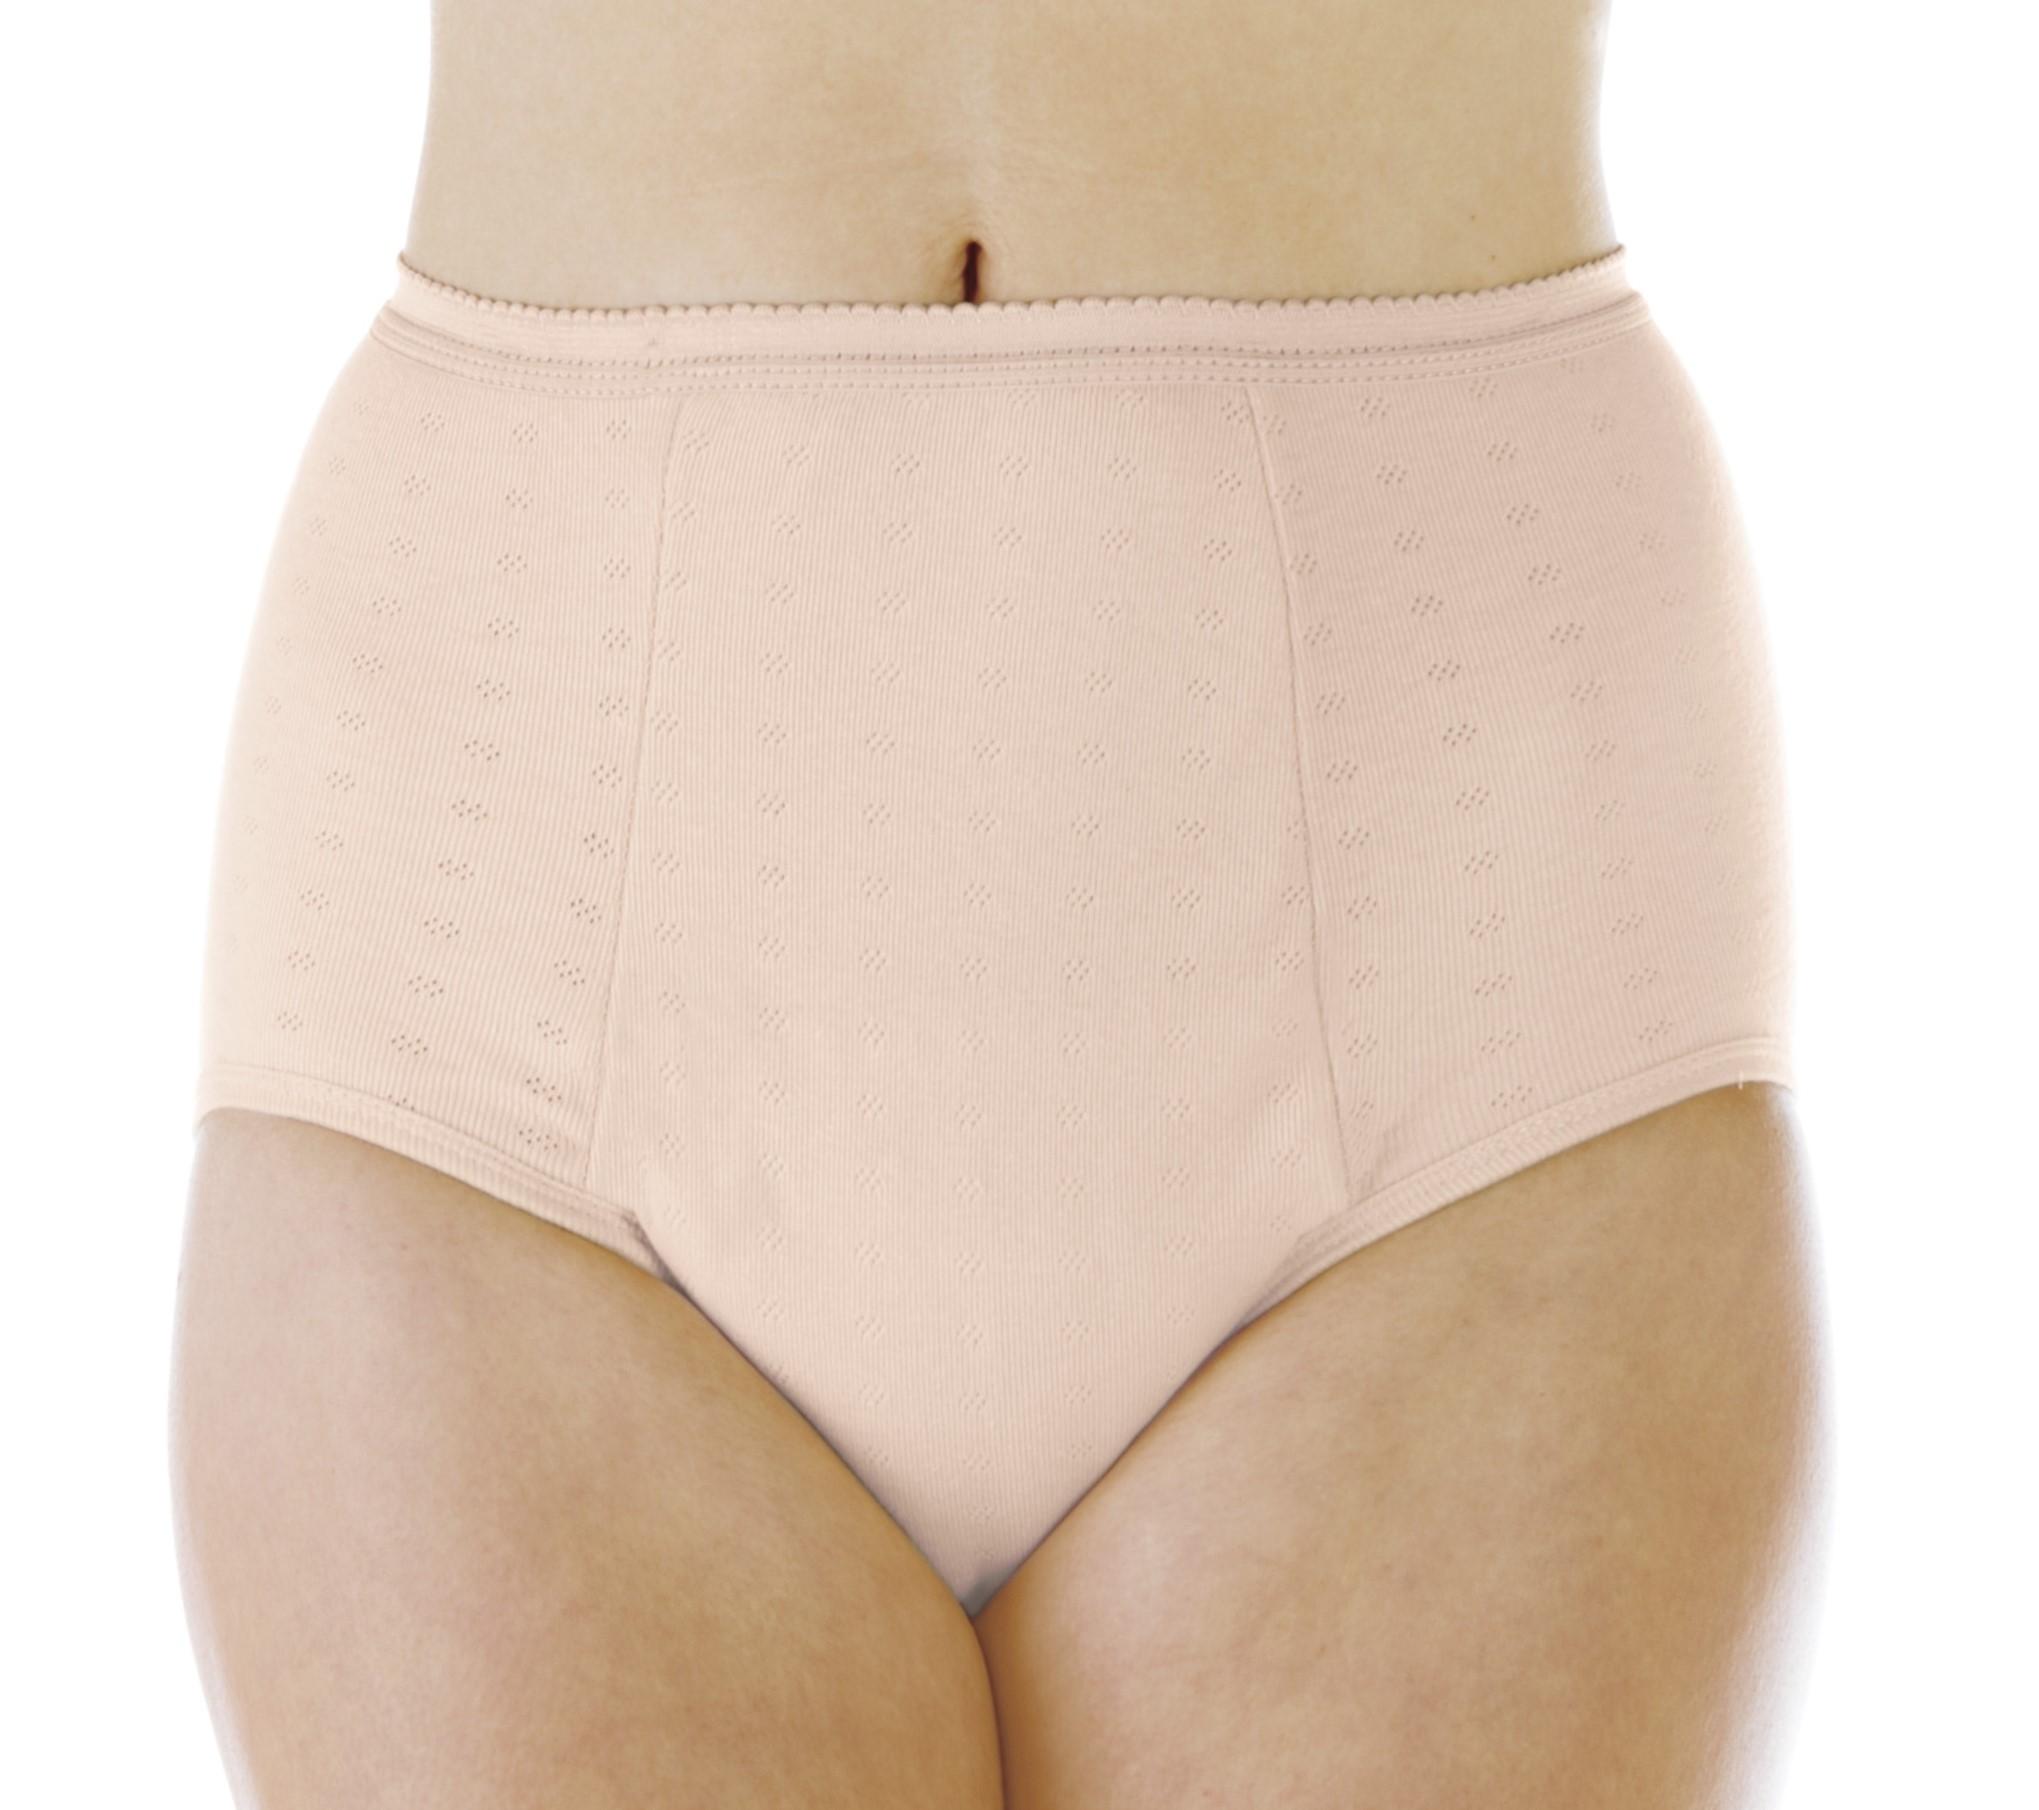 Wearever Washable Reusable Underwear Cotton /& Lace Incontinence Panties 6-Pack